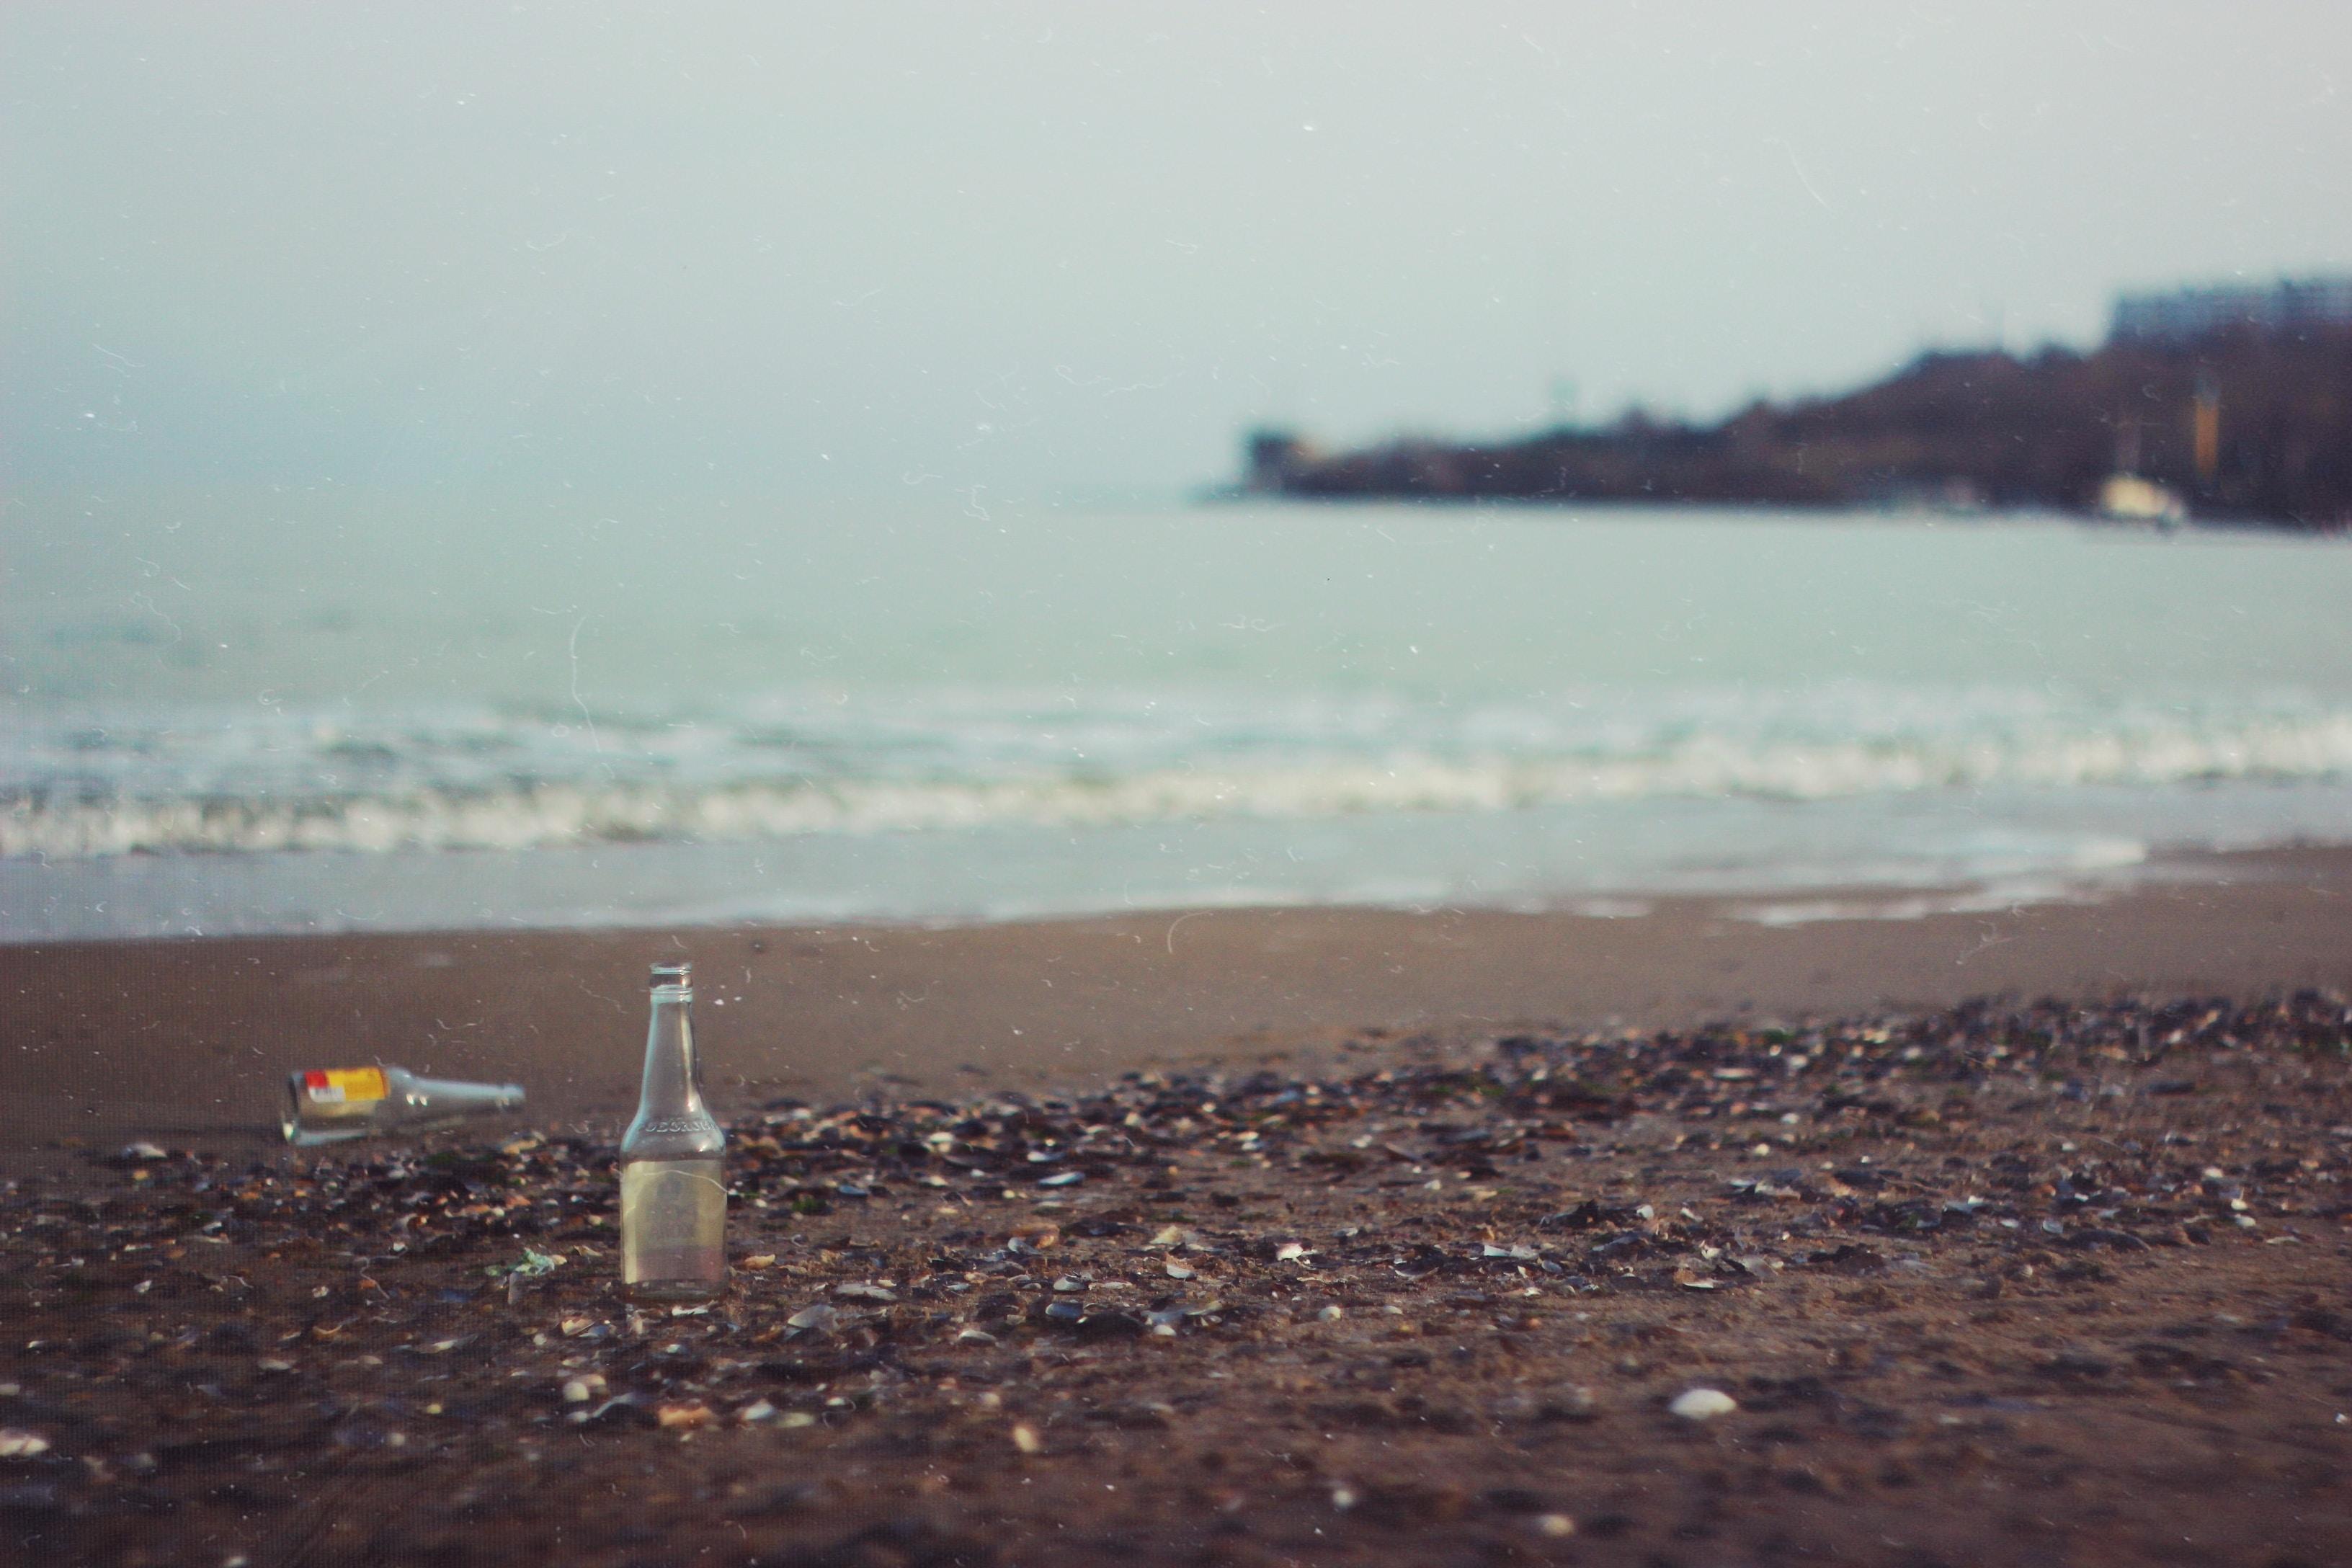 clear glass bottle on beach